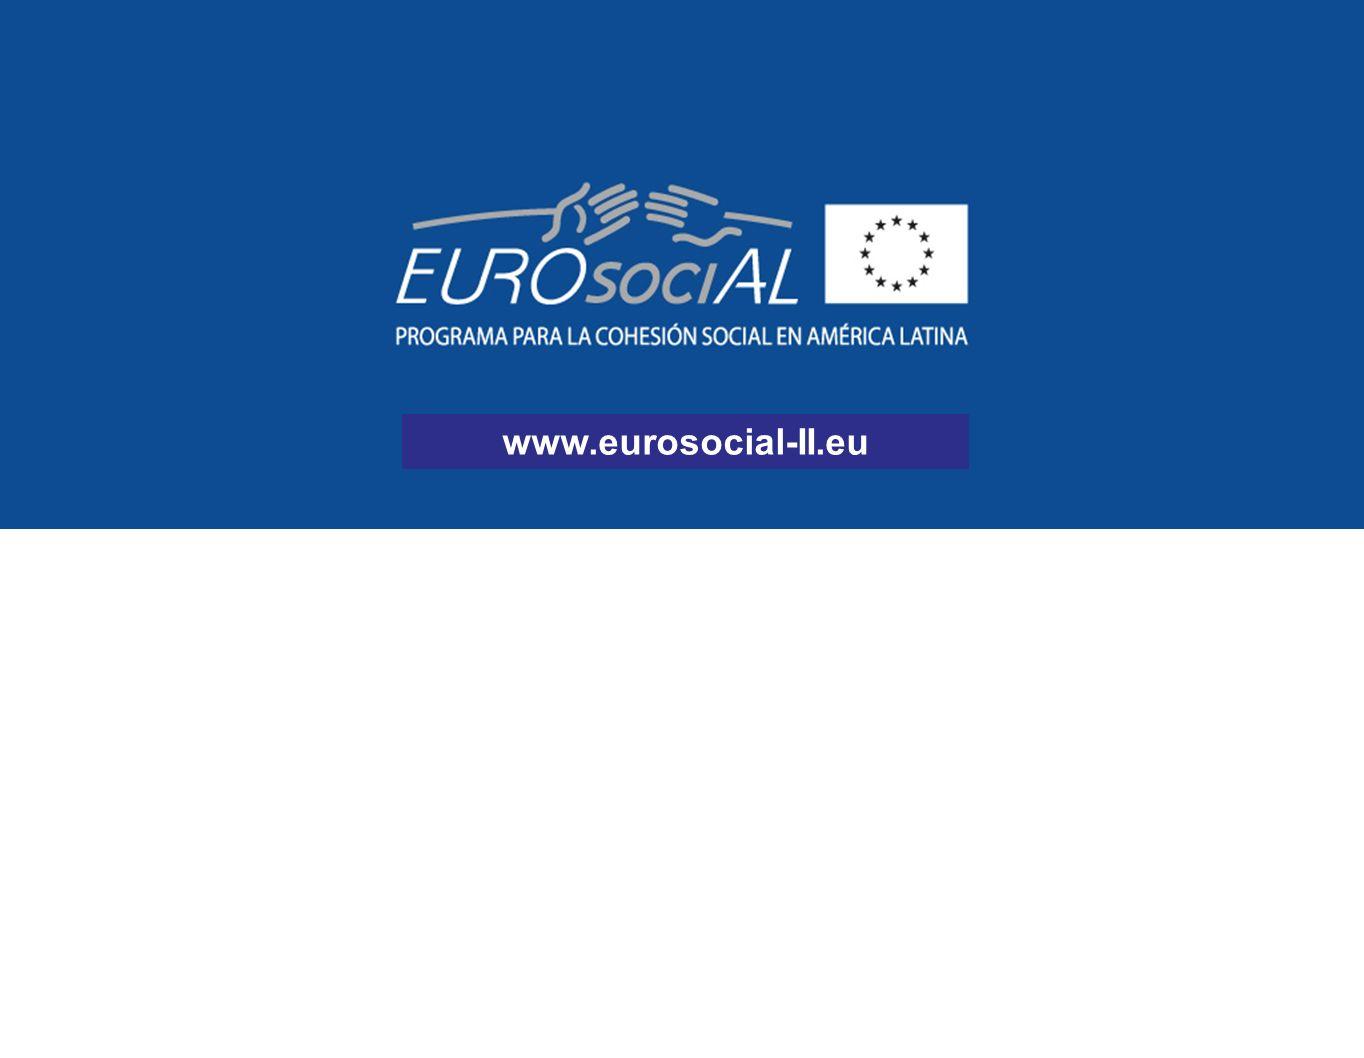 www.eurosocial-II.eu